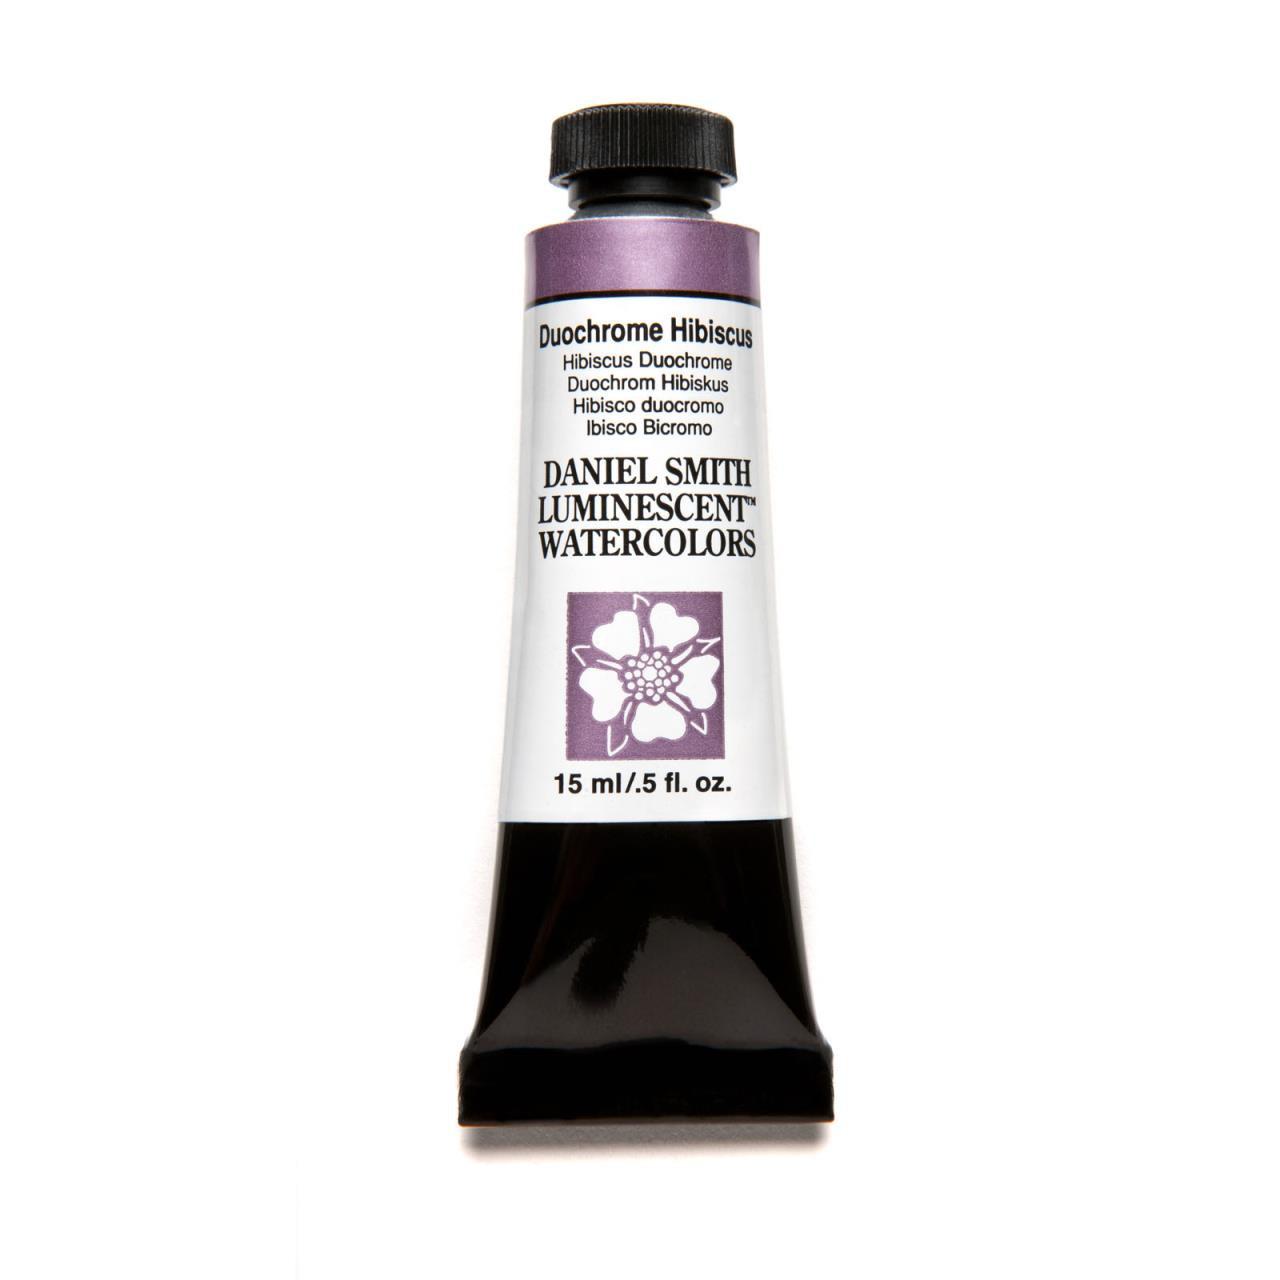 Duochrome Hibiscus (Luminescent), DANIEL SMITH Extra Fine Watercolors 15ml Tubes -